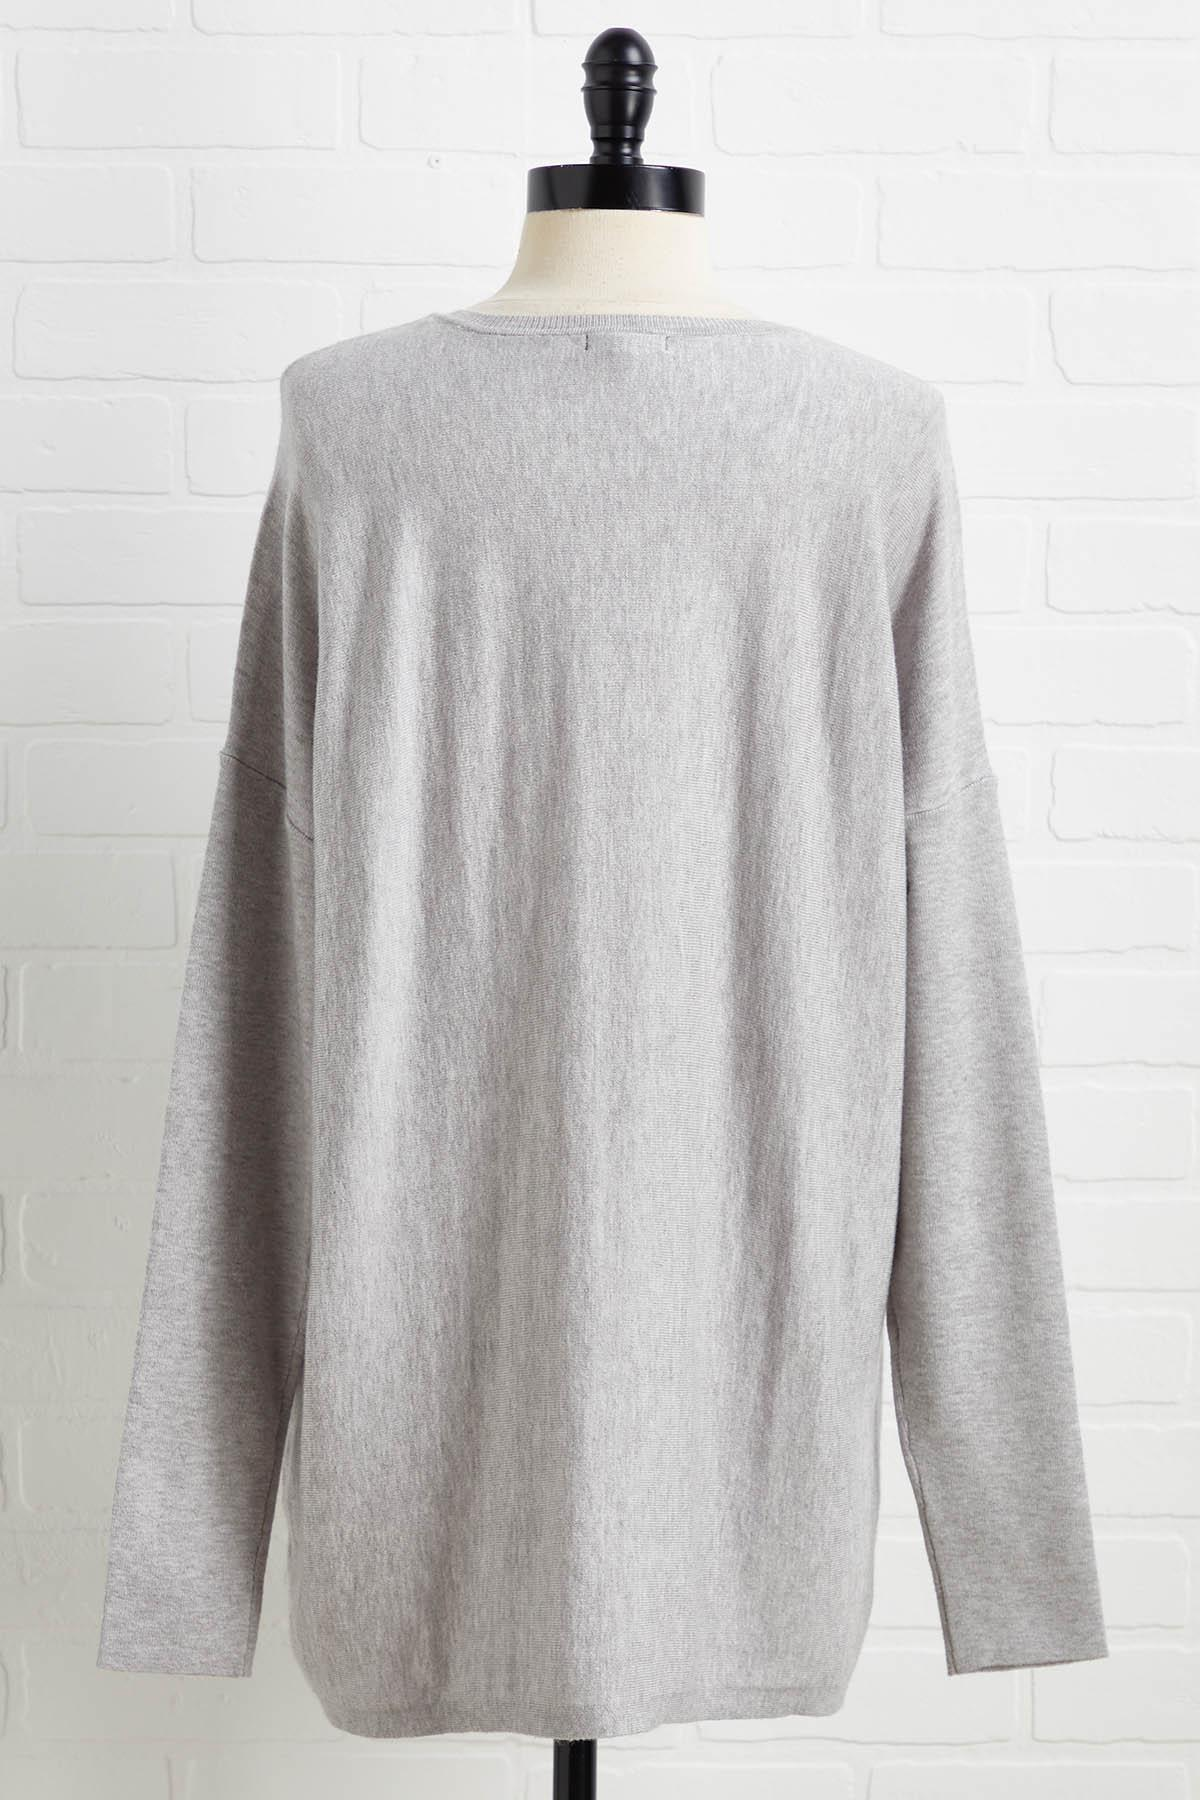 Not So Basic Sweater